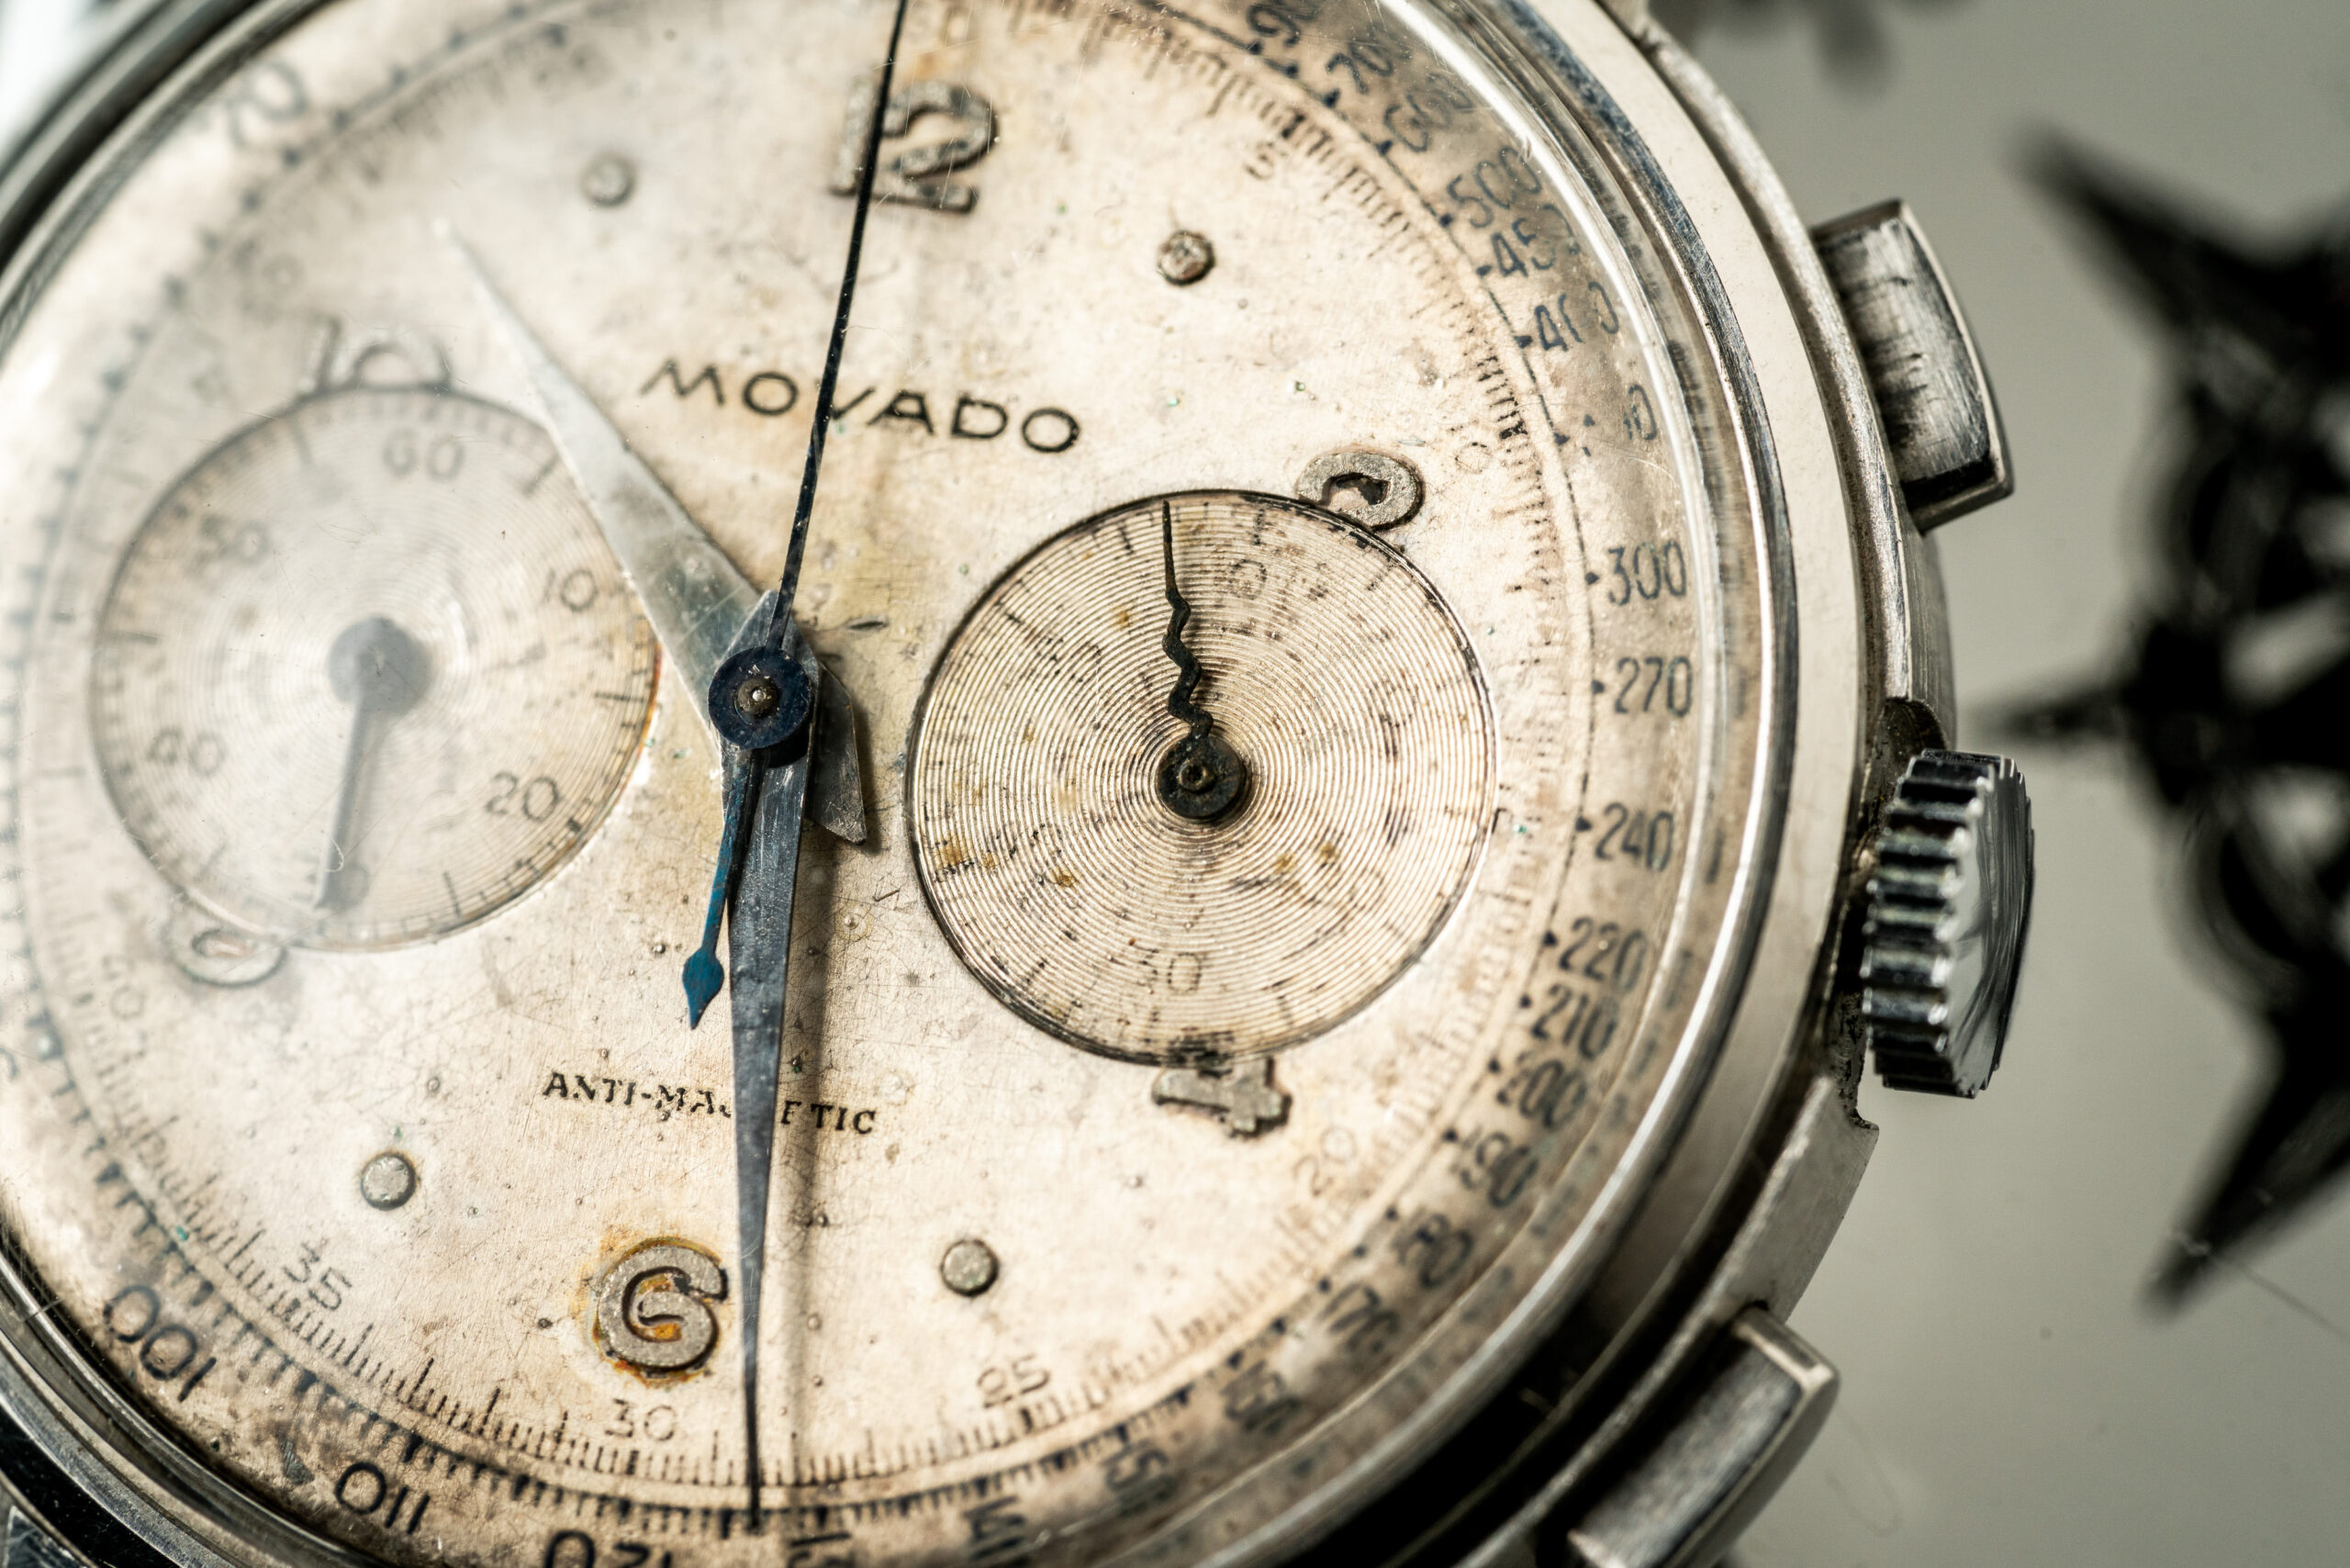 Movado chronograaf 19023 horloge jaren 40 macro